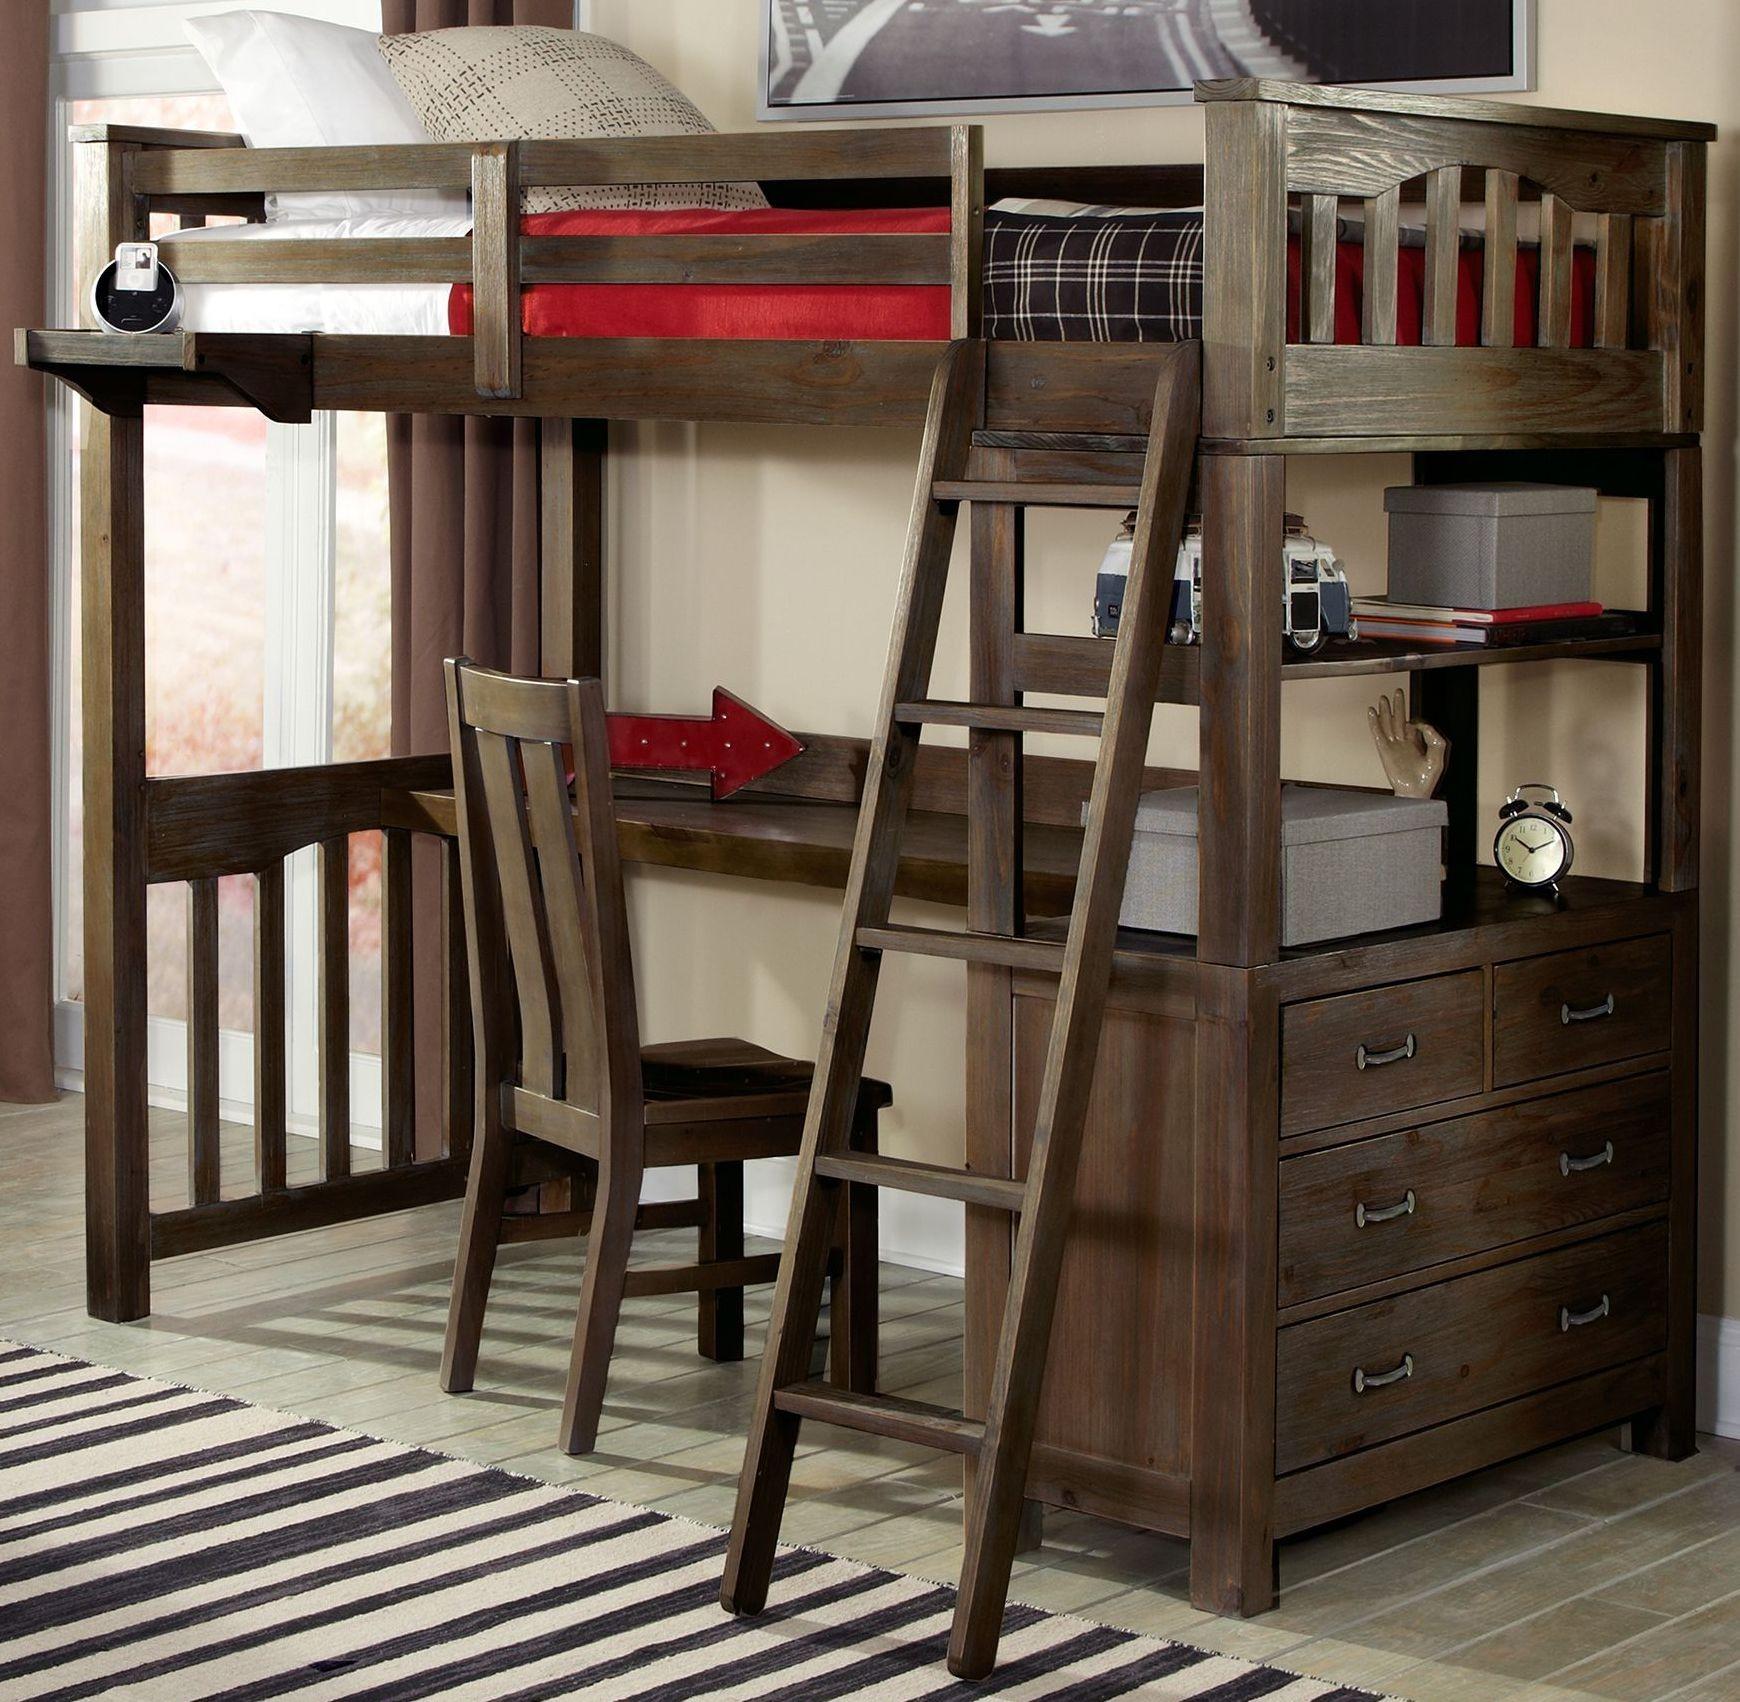 highlands espresso twin loft bed with desk and chair 11070ndc ne kids. Black Bedroom Furniture Sets. Home Design Ideas